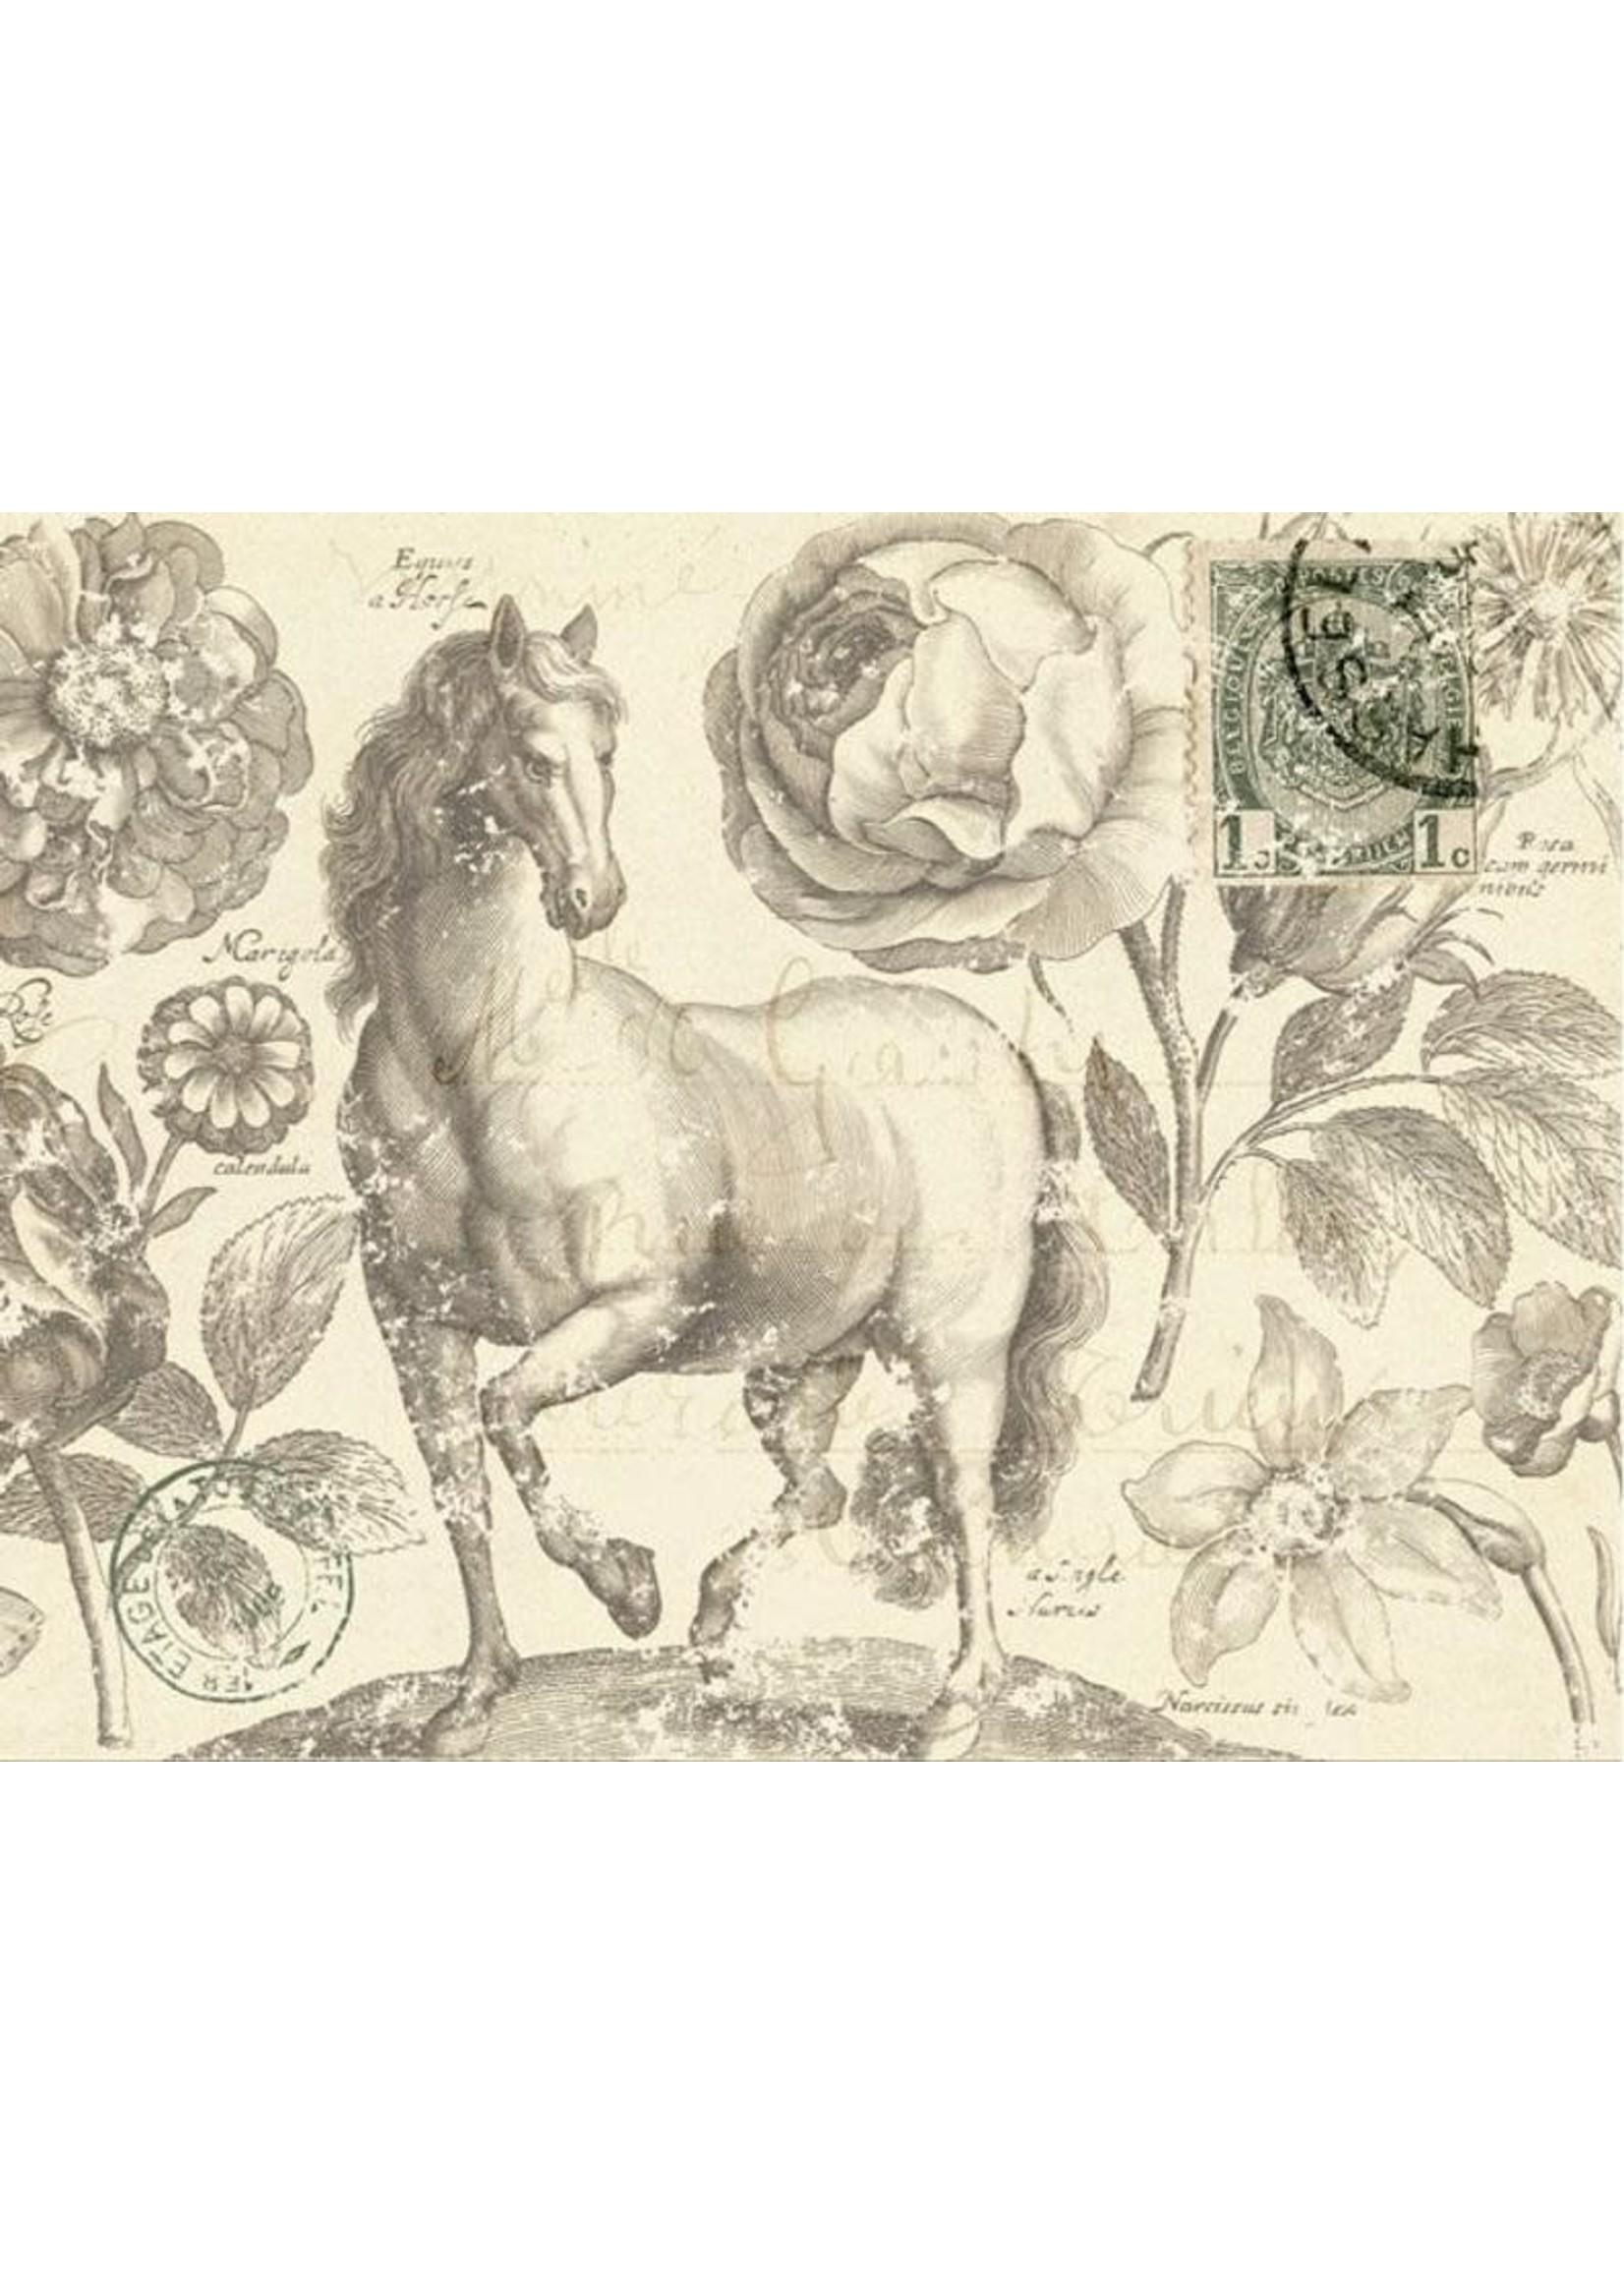 Roycycled Treasures Botanical Equine Decoupage Paper  by Roycyled Treasures